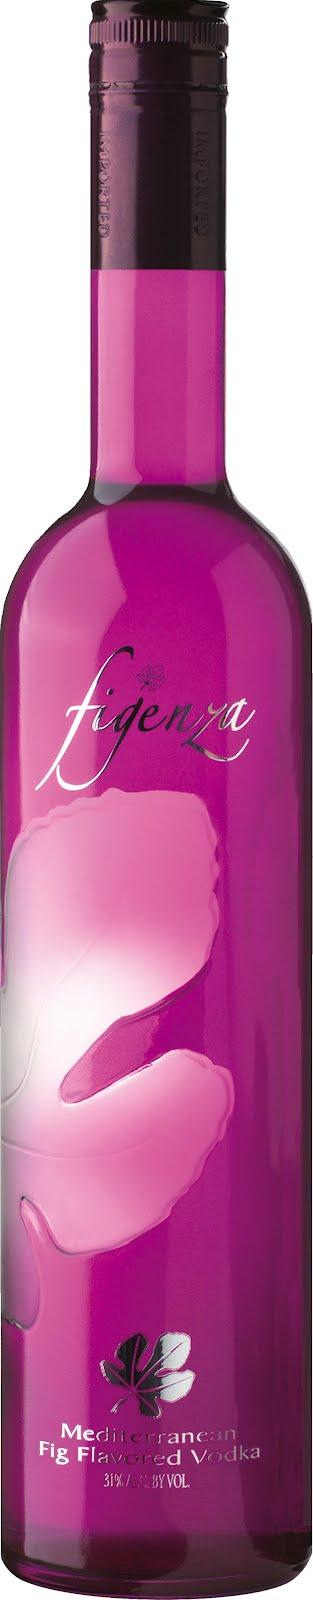 Figenza